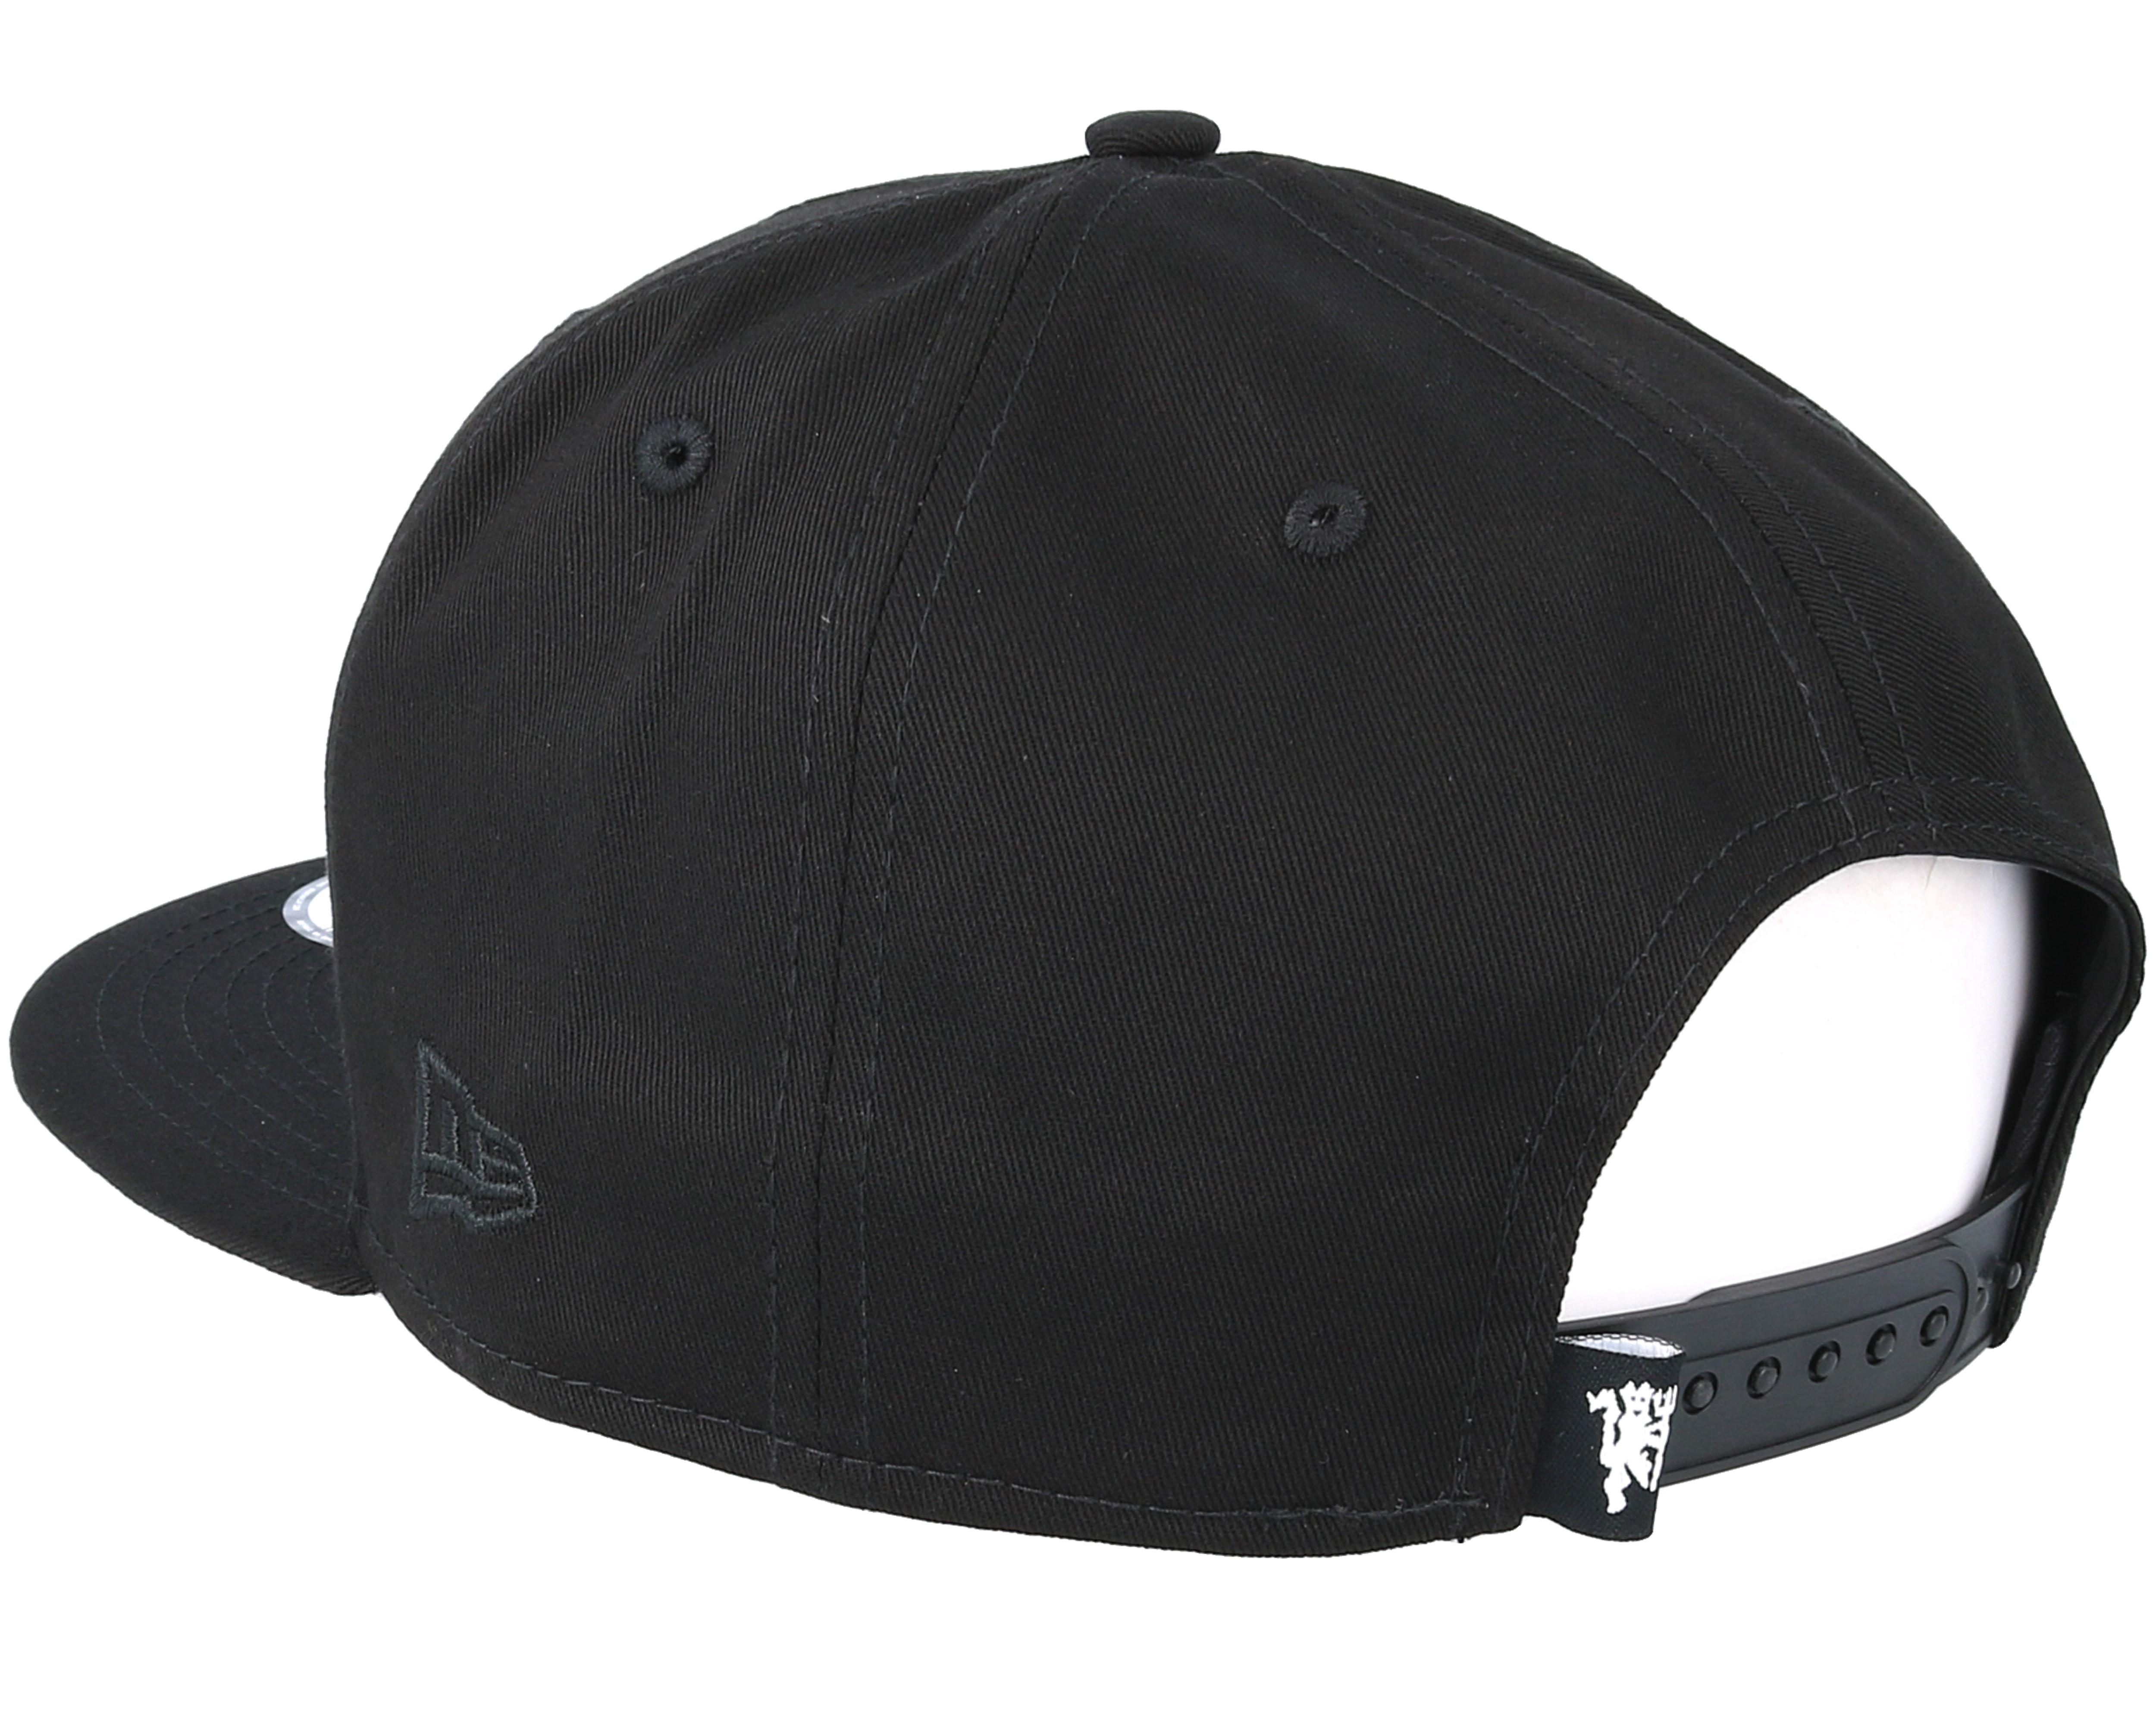 best service 1db51 f9c1d Manchester United Bob Devil Black Snapback - New Era caps   Hatstore ...